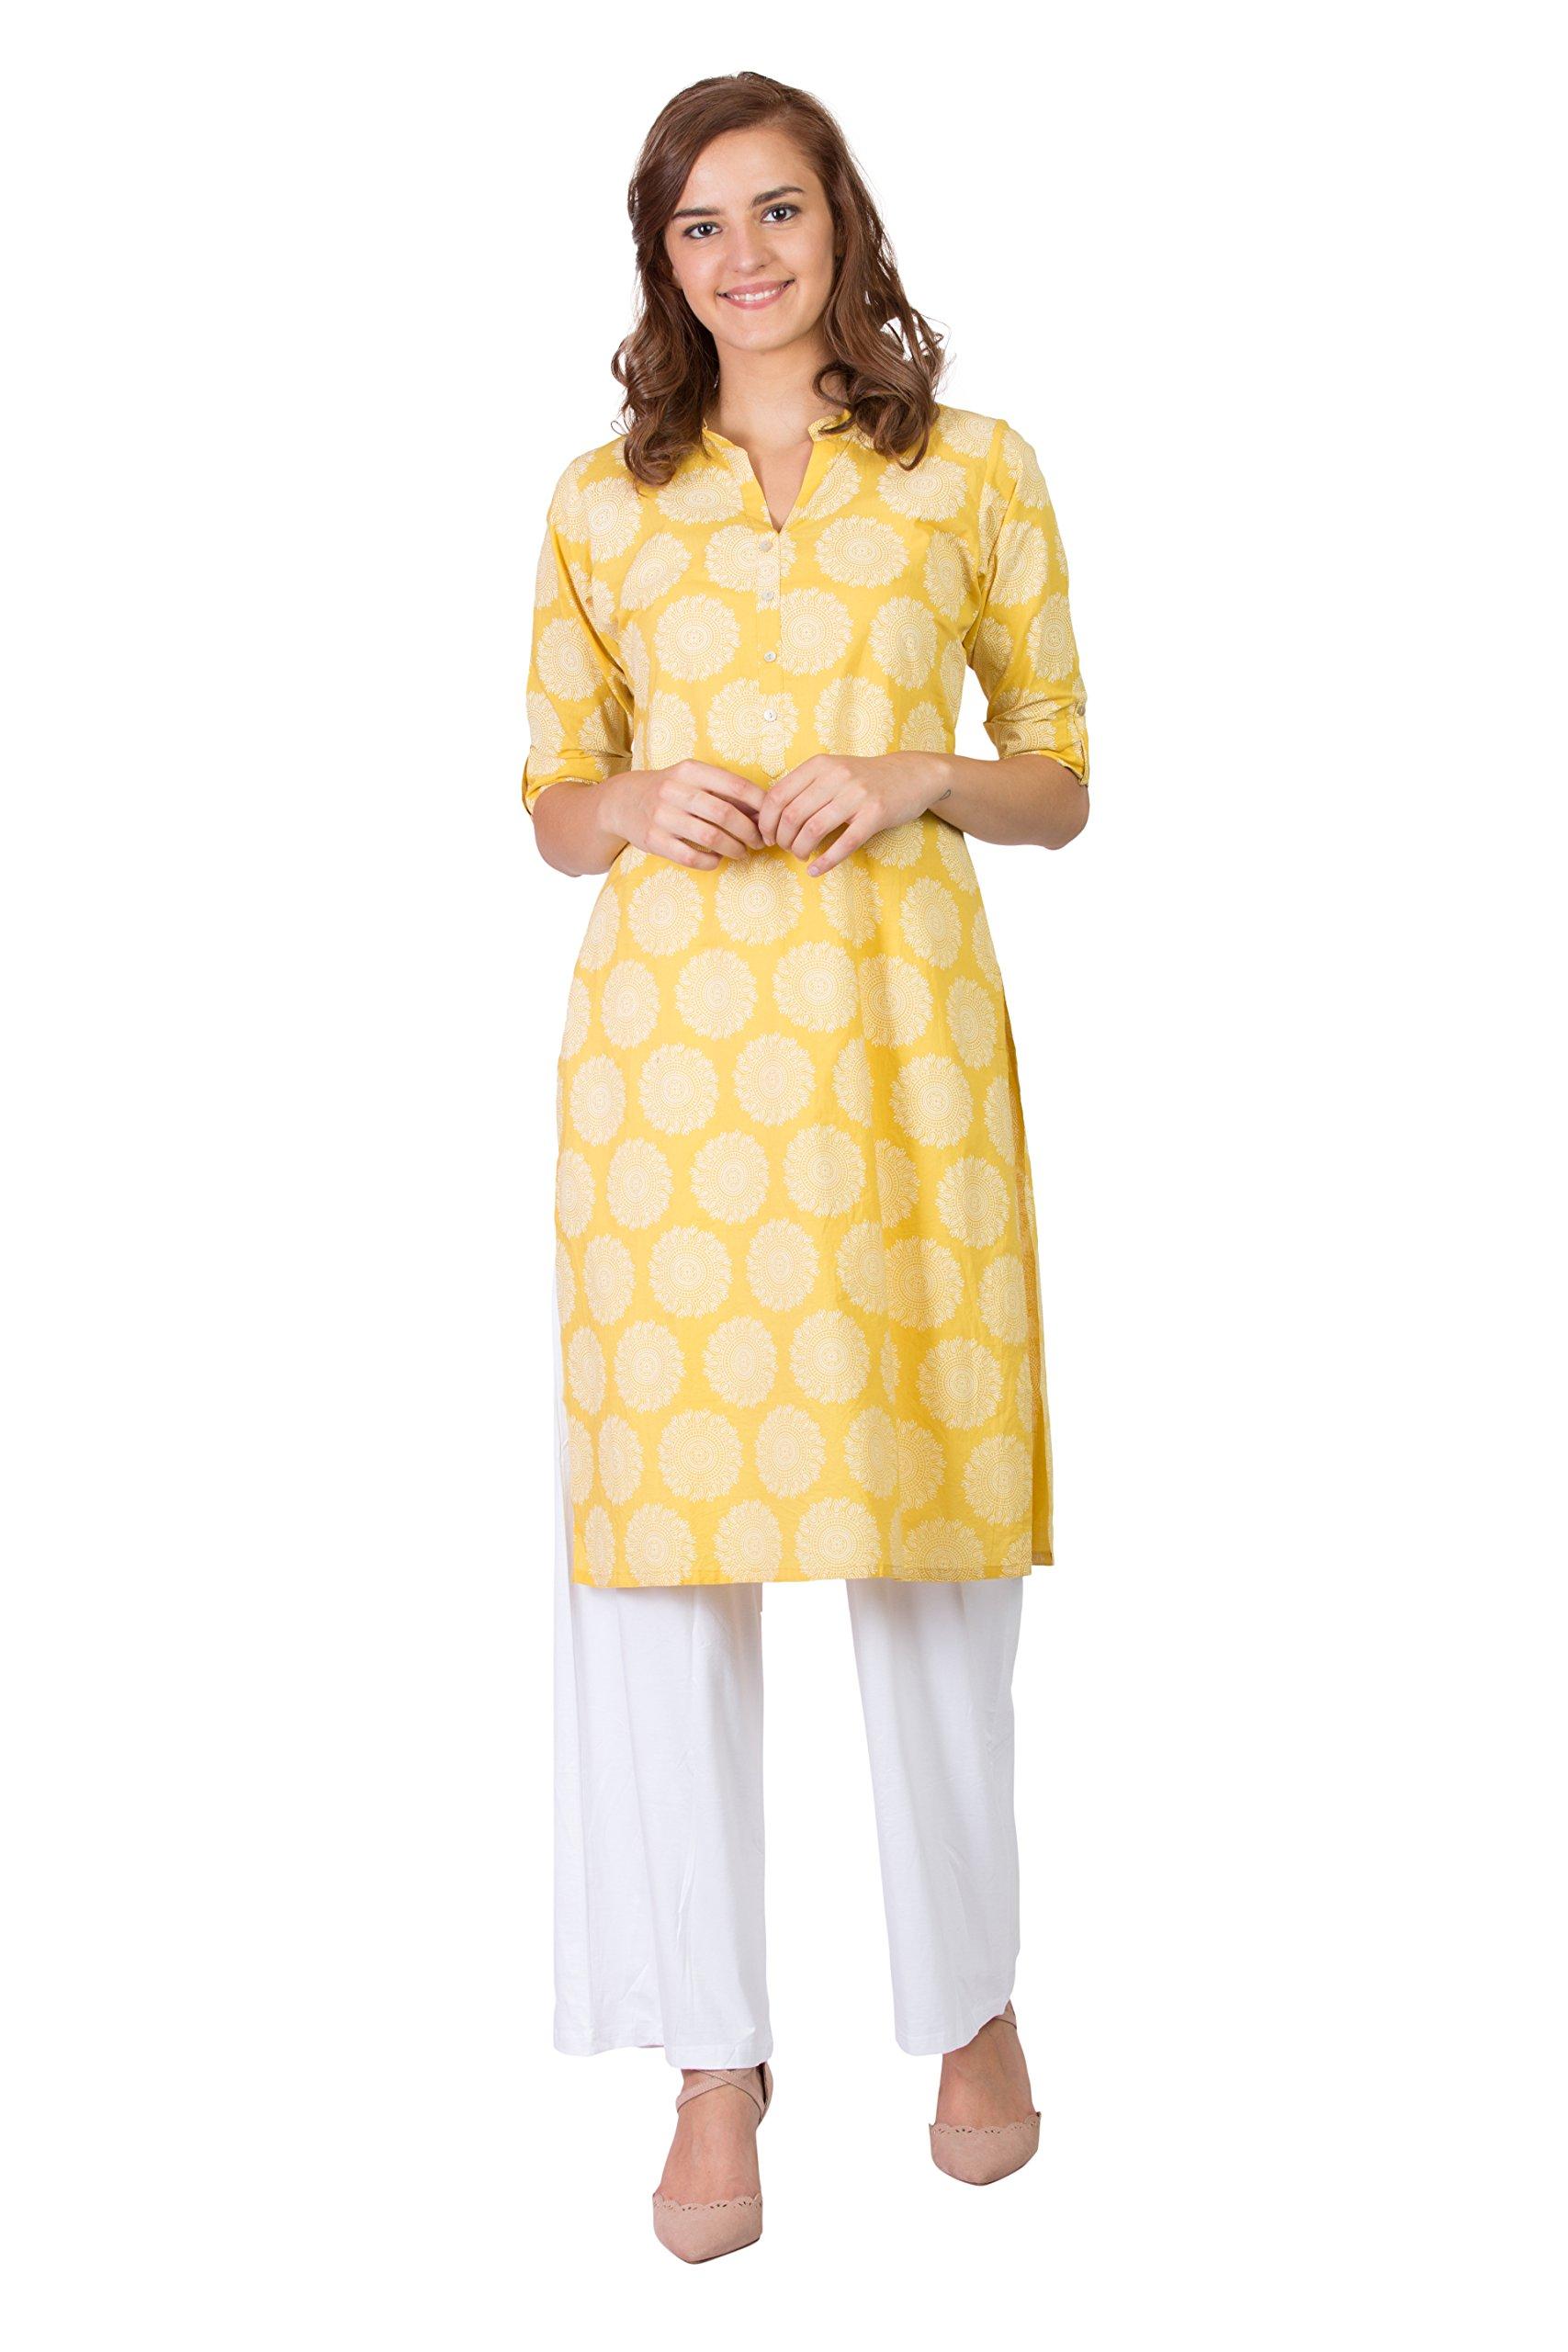 SABHYATA Women Kurta Designer Ethnic Long Dress Casual Tunic Kurti for Women Ladies Partywear Material 100% Pure Cotton Chinese Collar Small Mustard